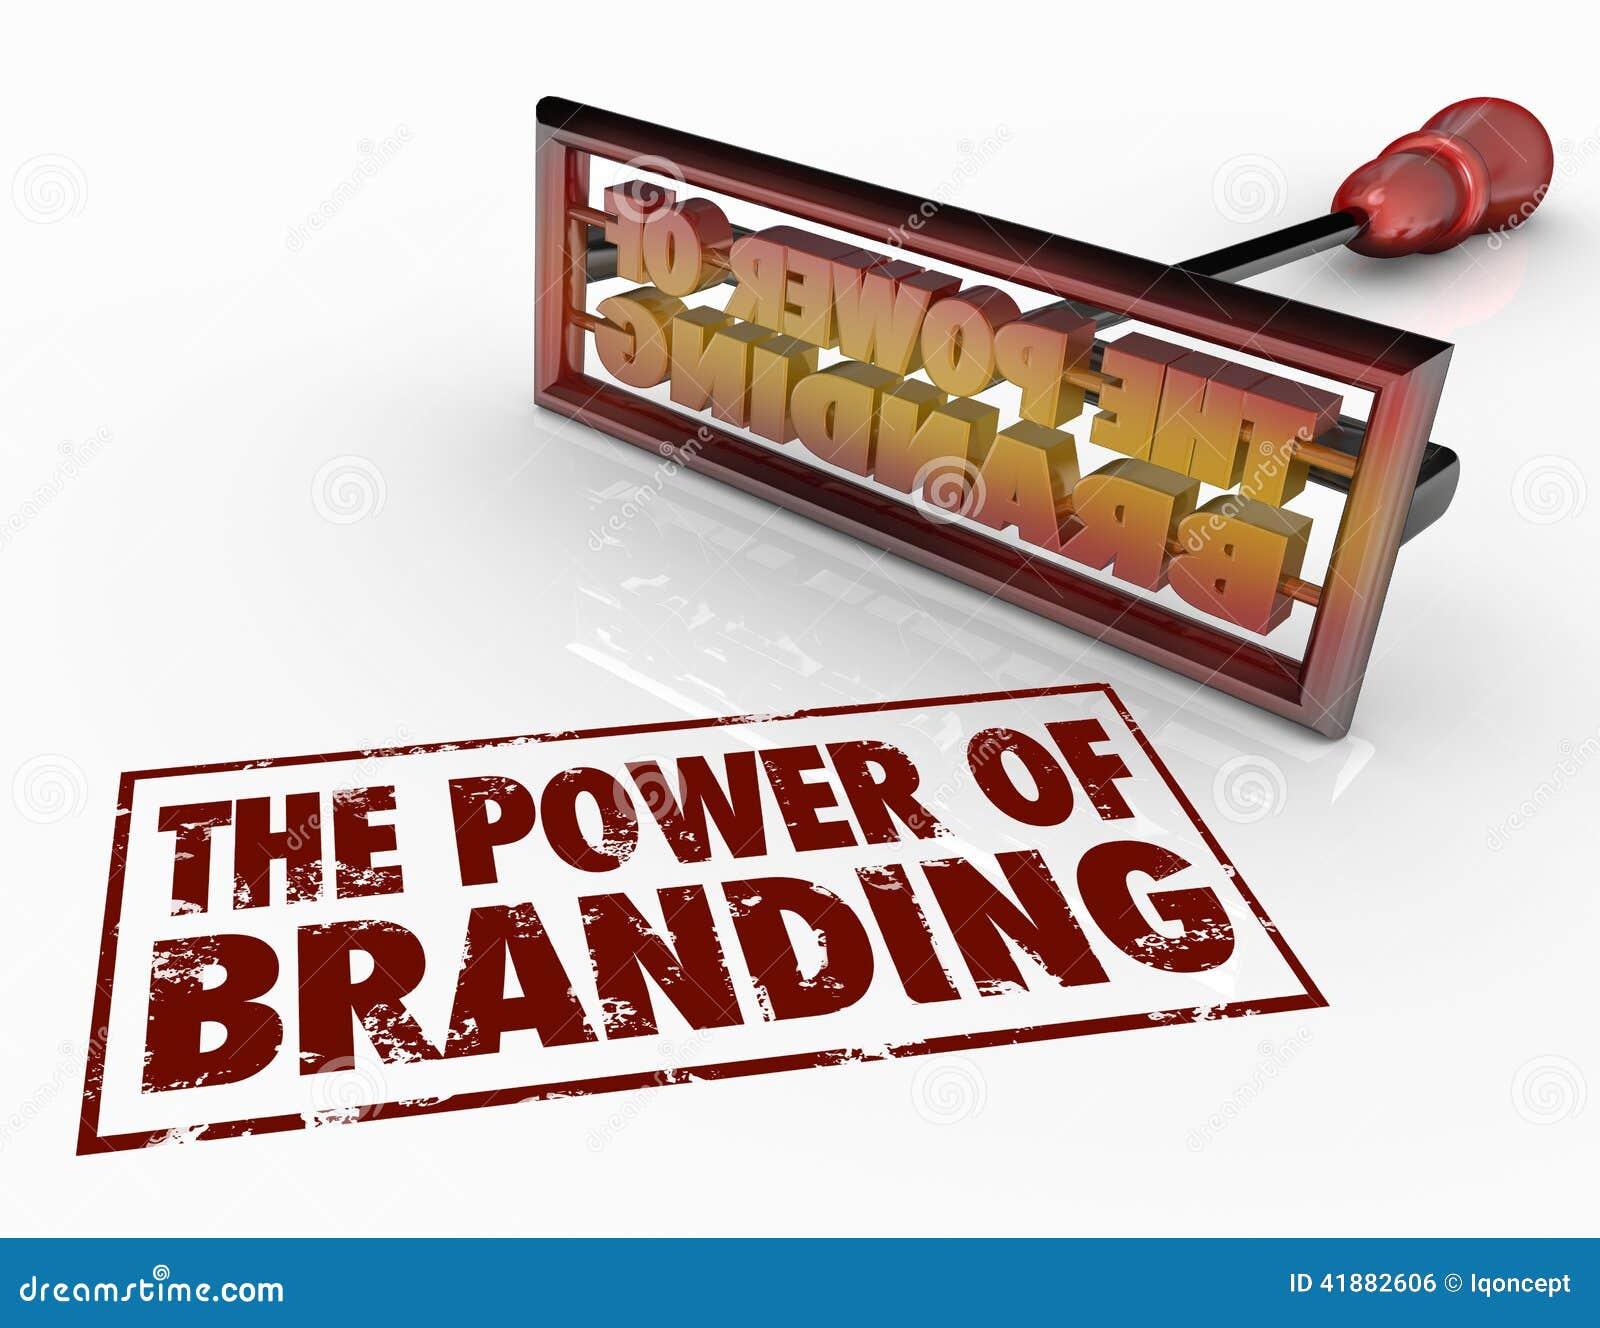 the power of brand name The power of brand name merchandise thu, apr 5, 2018 2:00 pm edt moderator: leo jakobson executive editor incentive speakers: paul gordon senior vice president of sales.